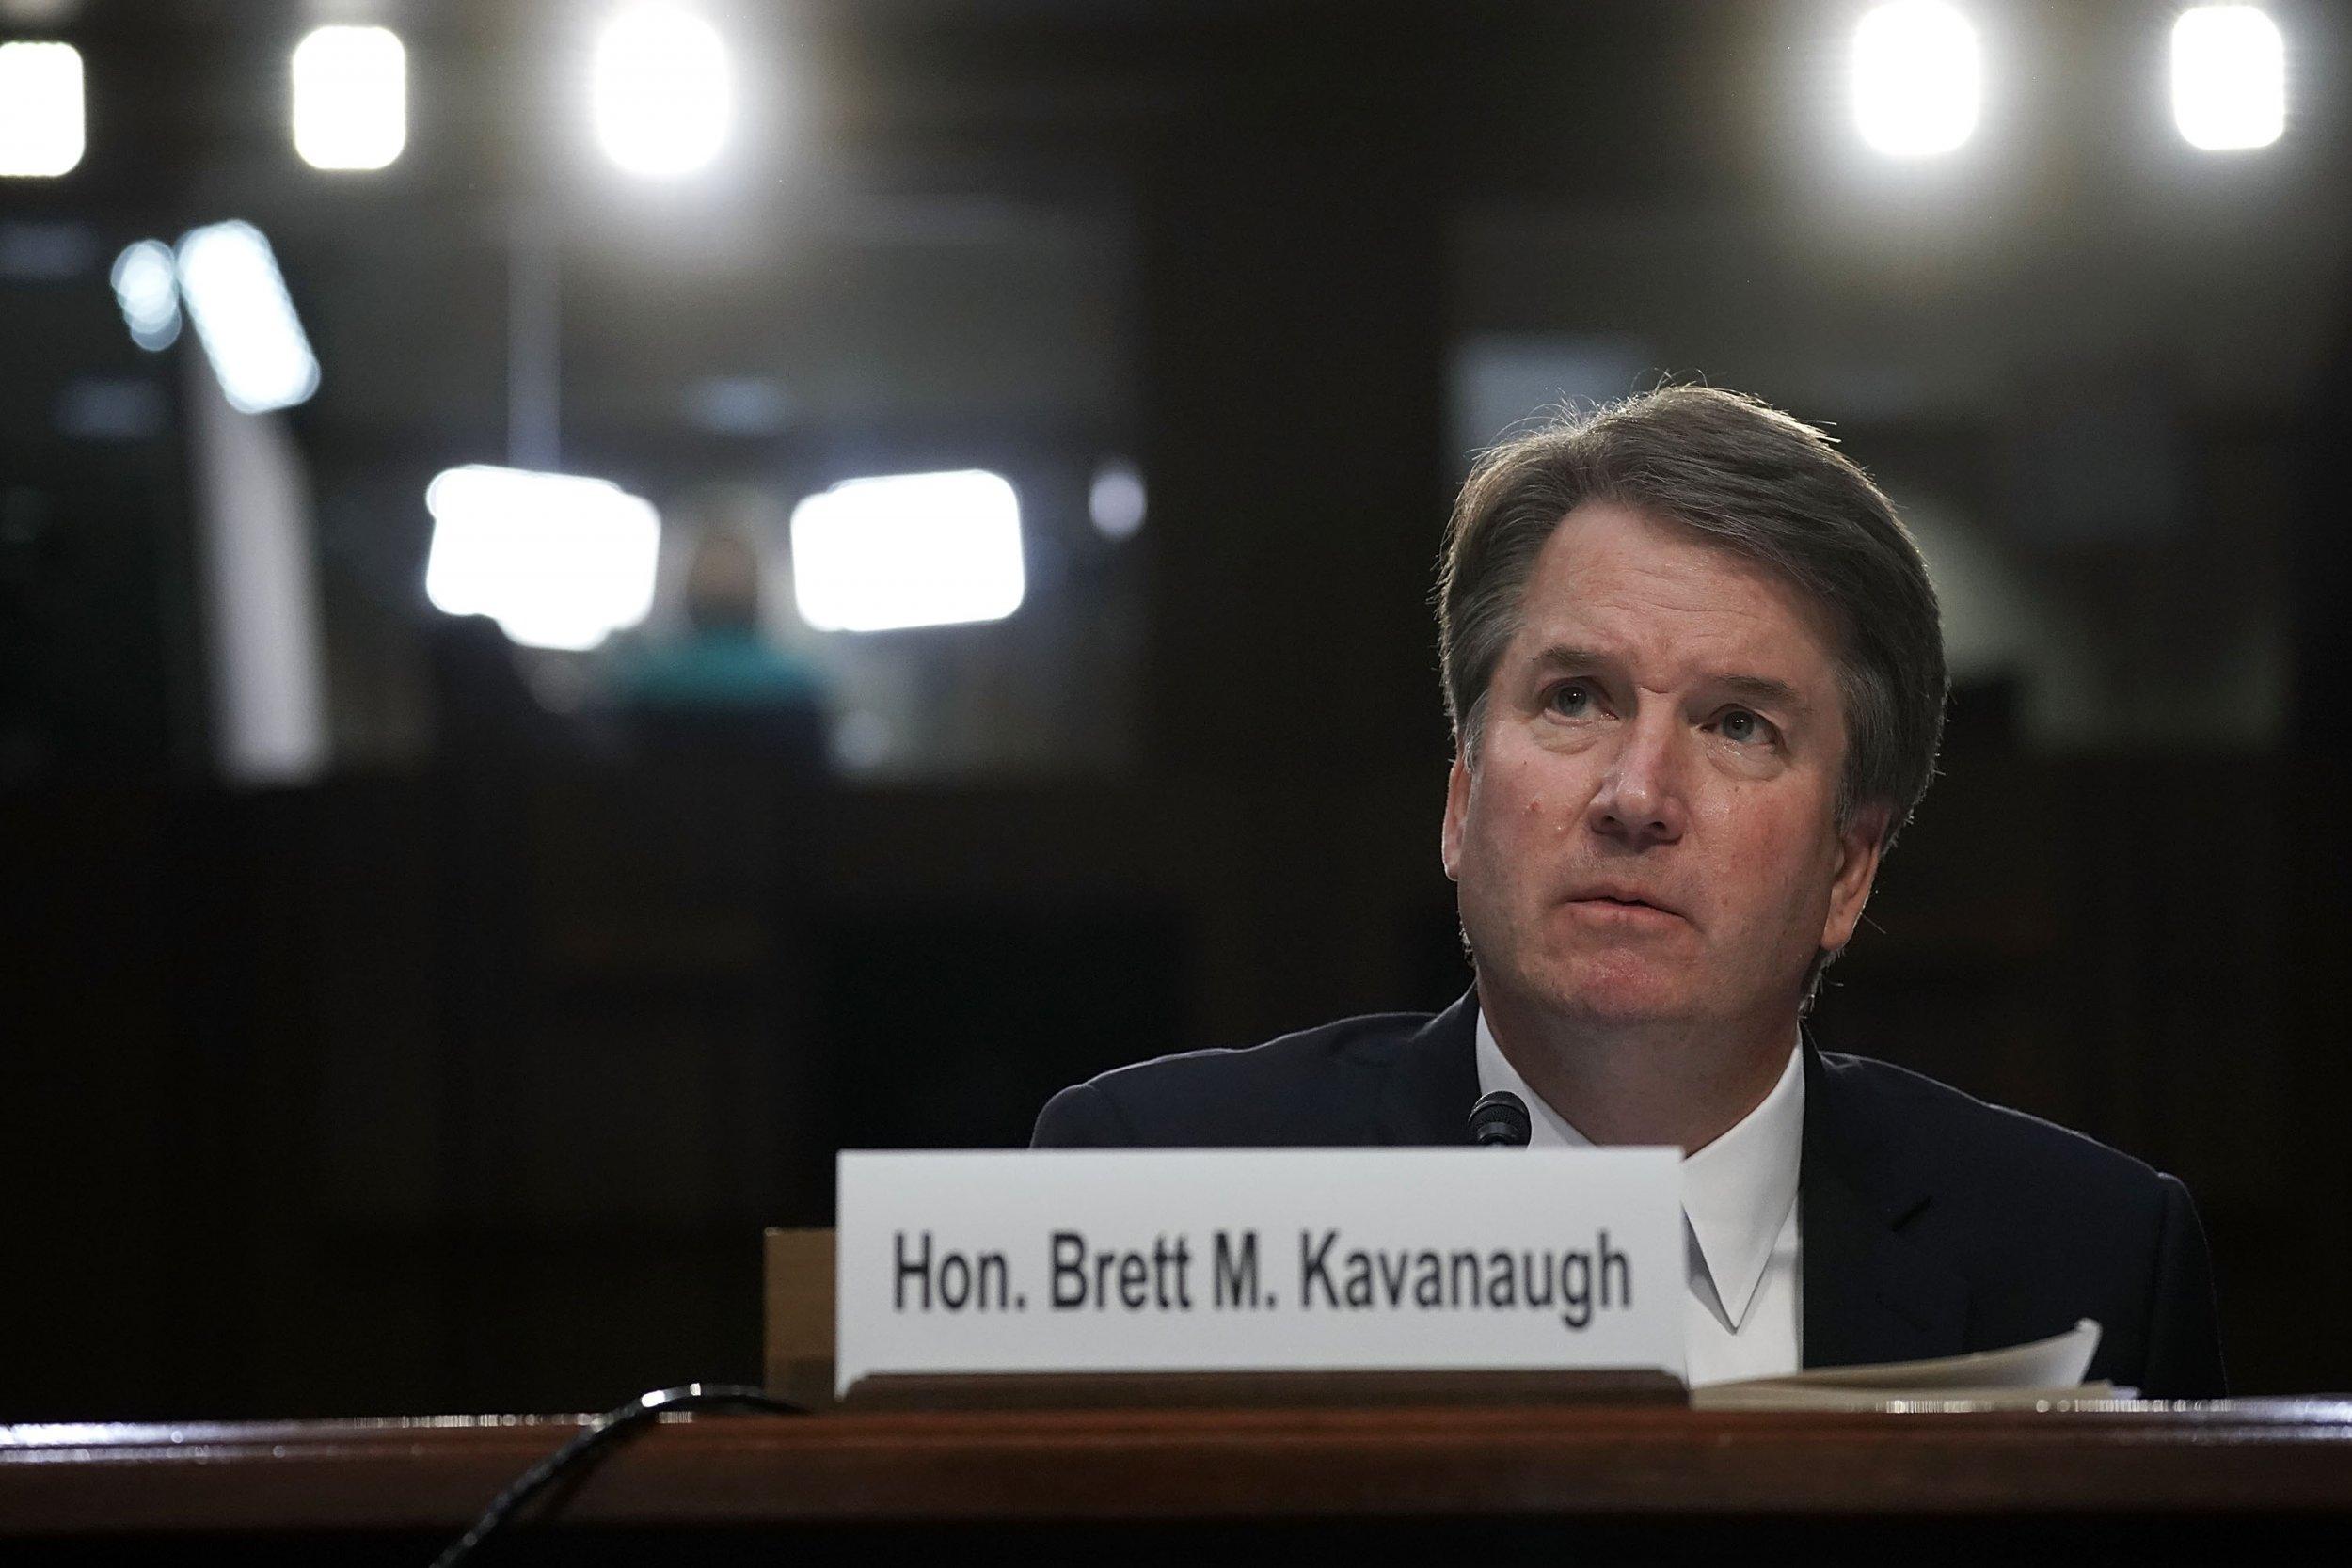 christine ford brett kavanaugh speak to senate